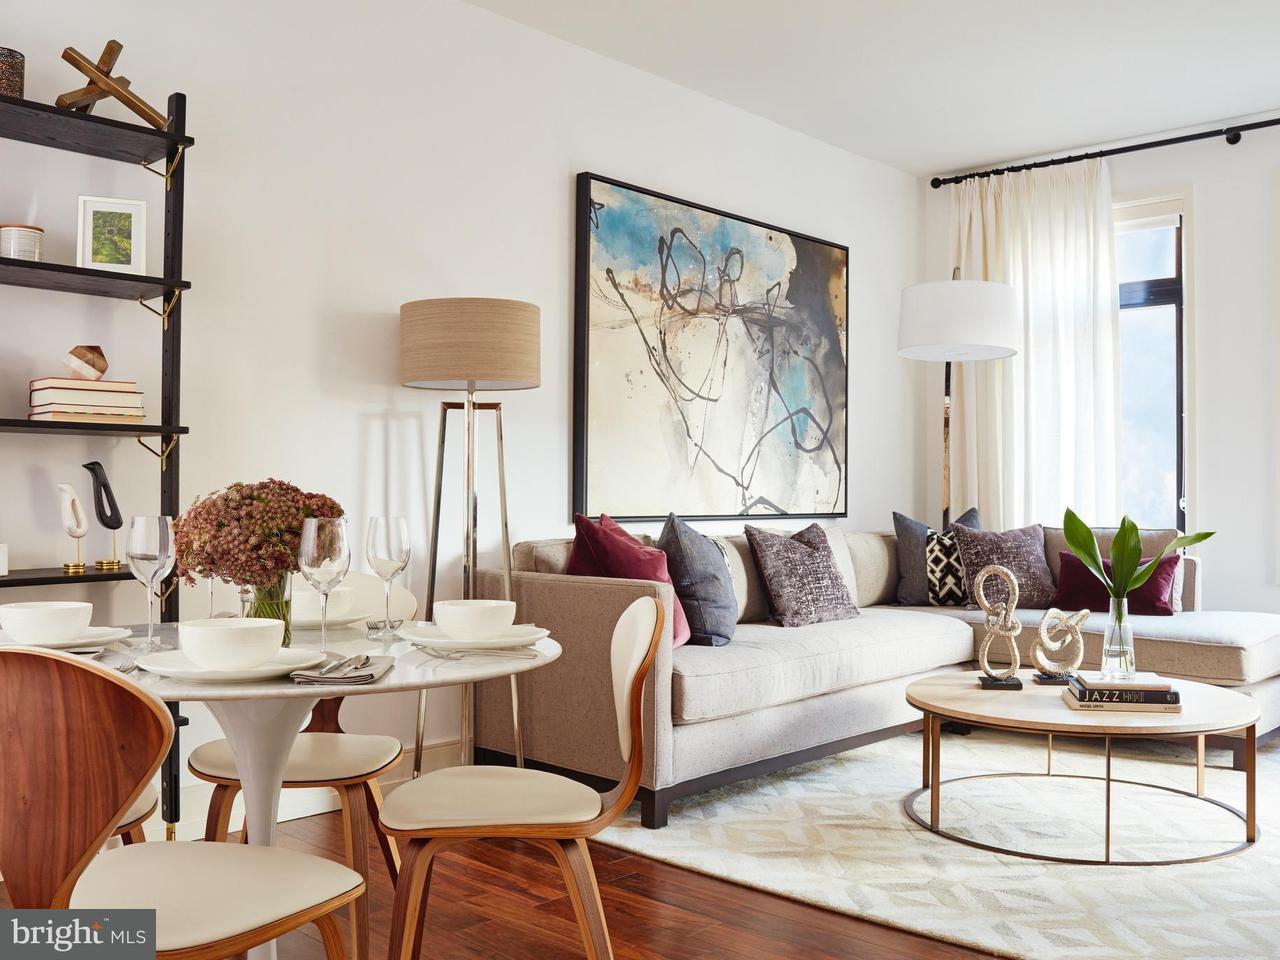 Condominium for Rent at 1310 U St NW #201 Washington, District Of Columbia 20009 United States